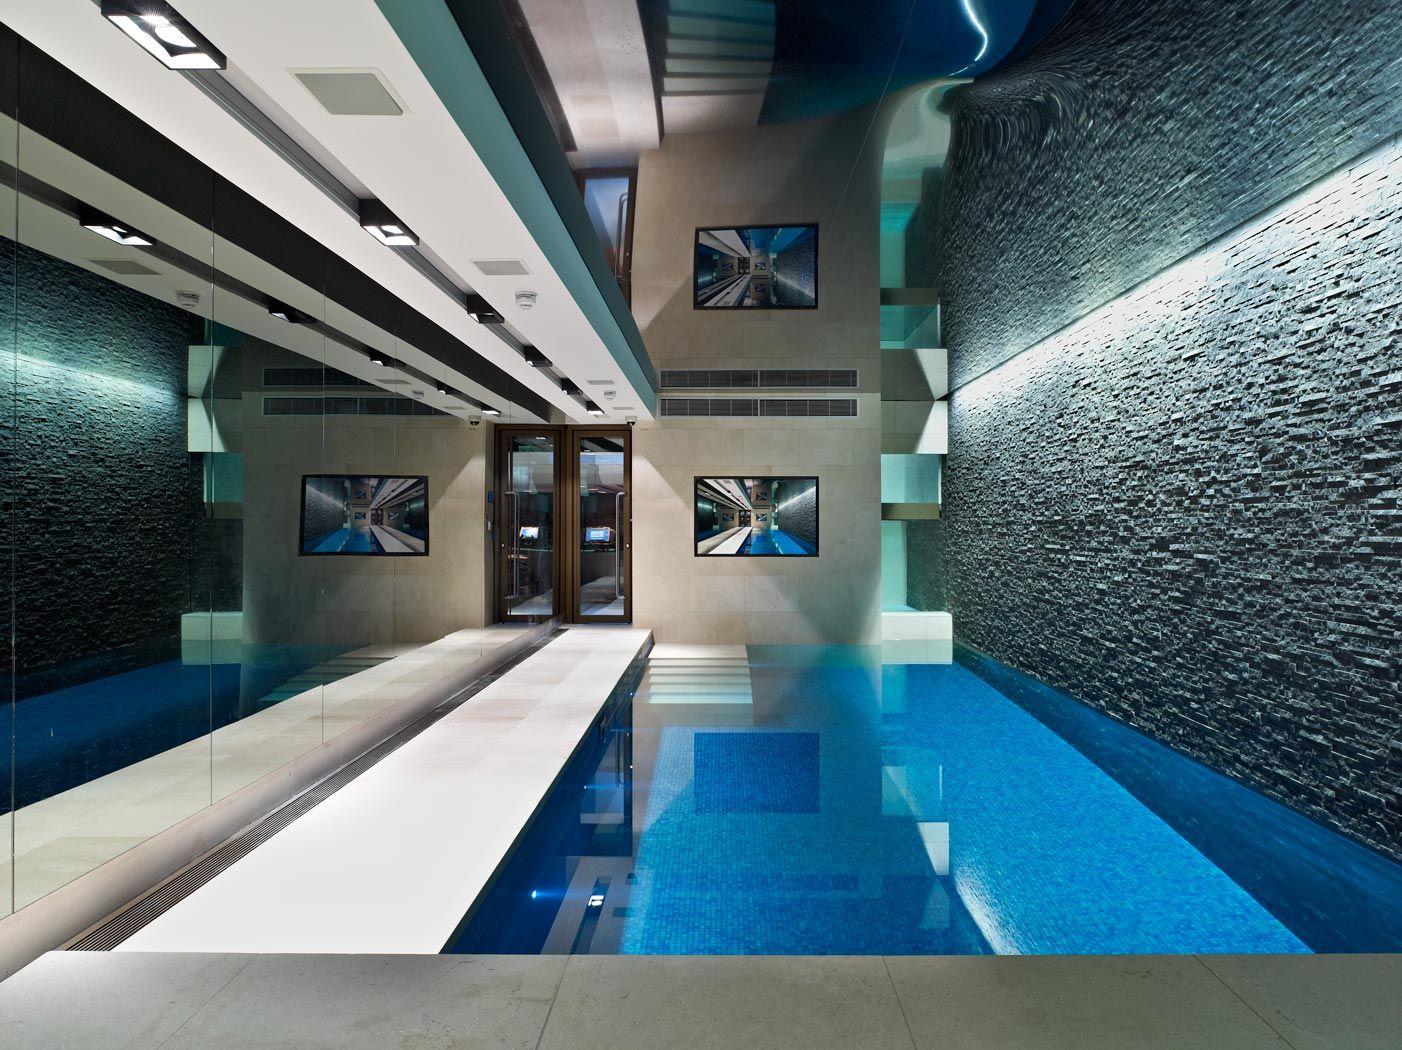 Page Not Found David Churchill Architectural Interiors Photographer London Ferienhaus Mit Innenpool Haus Ferienhaus